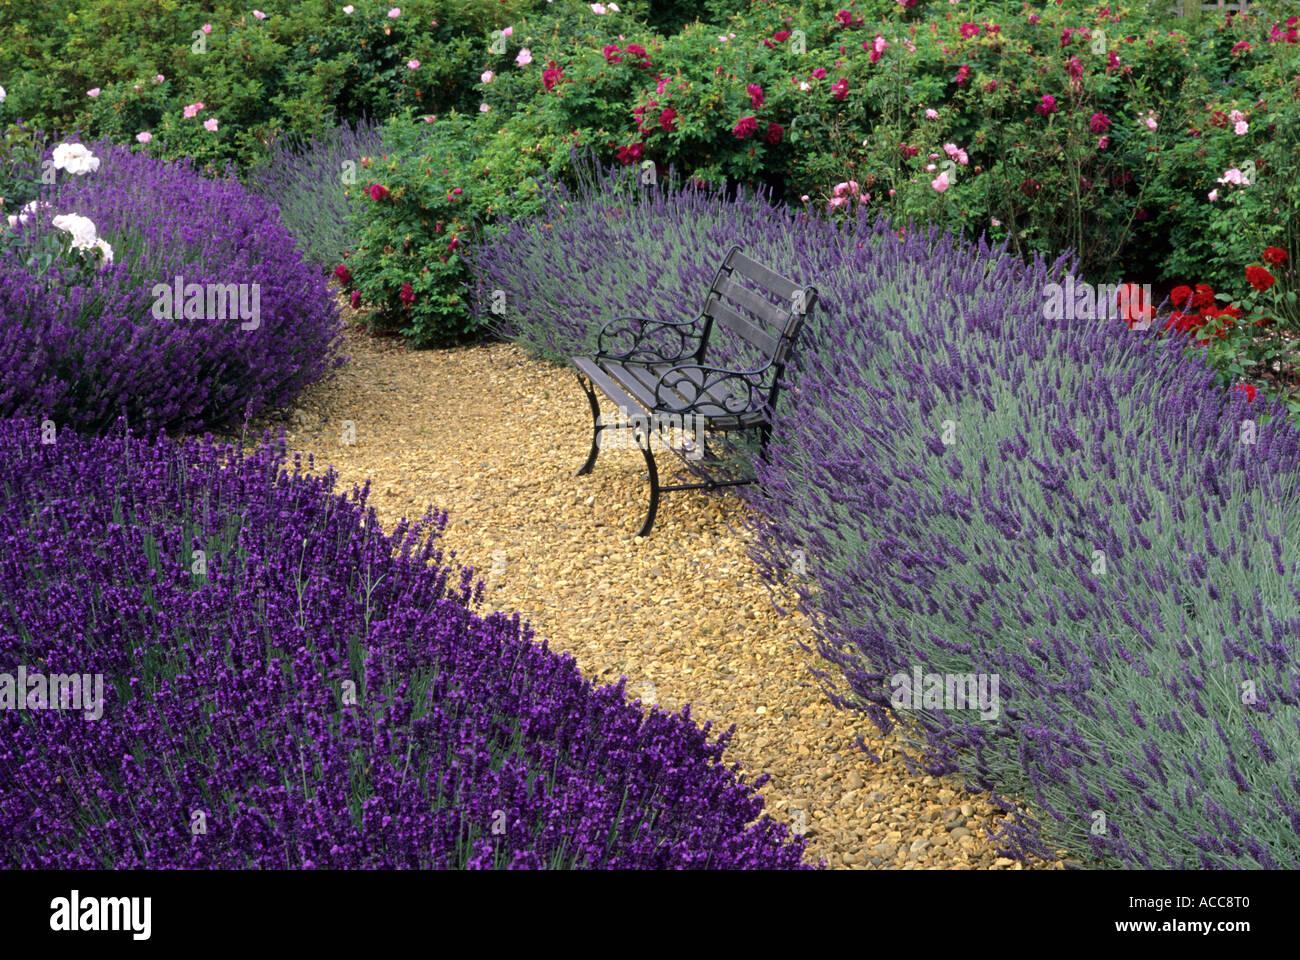 Lavandula Angustifolia U0027Imperial Gemu0027 And Lavandula Angustifolia U0027Sawyersu0027,  Garden Bench, Furniture, Roses, Gravel Path